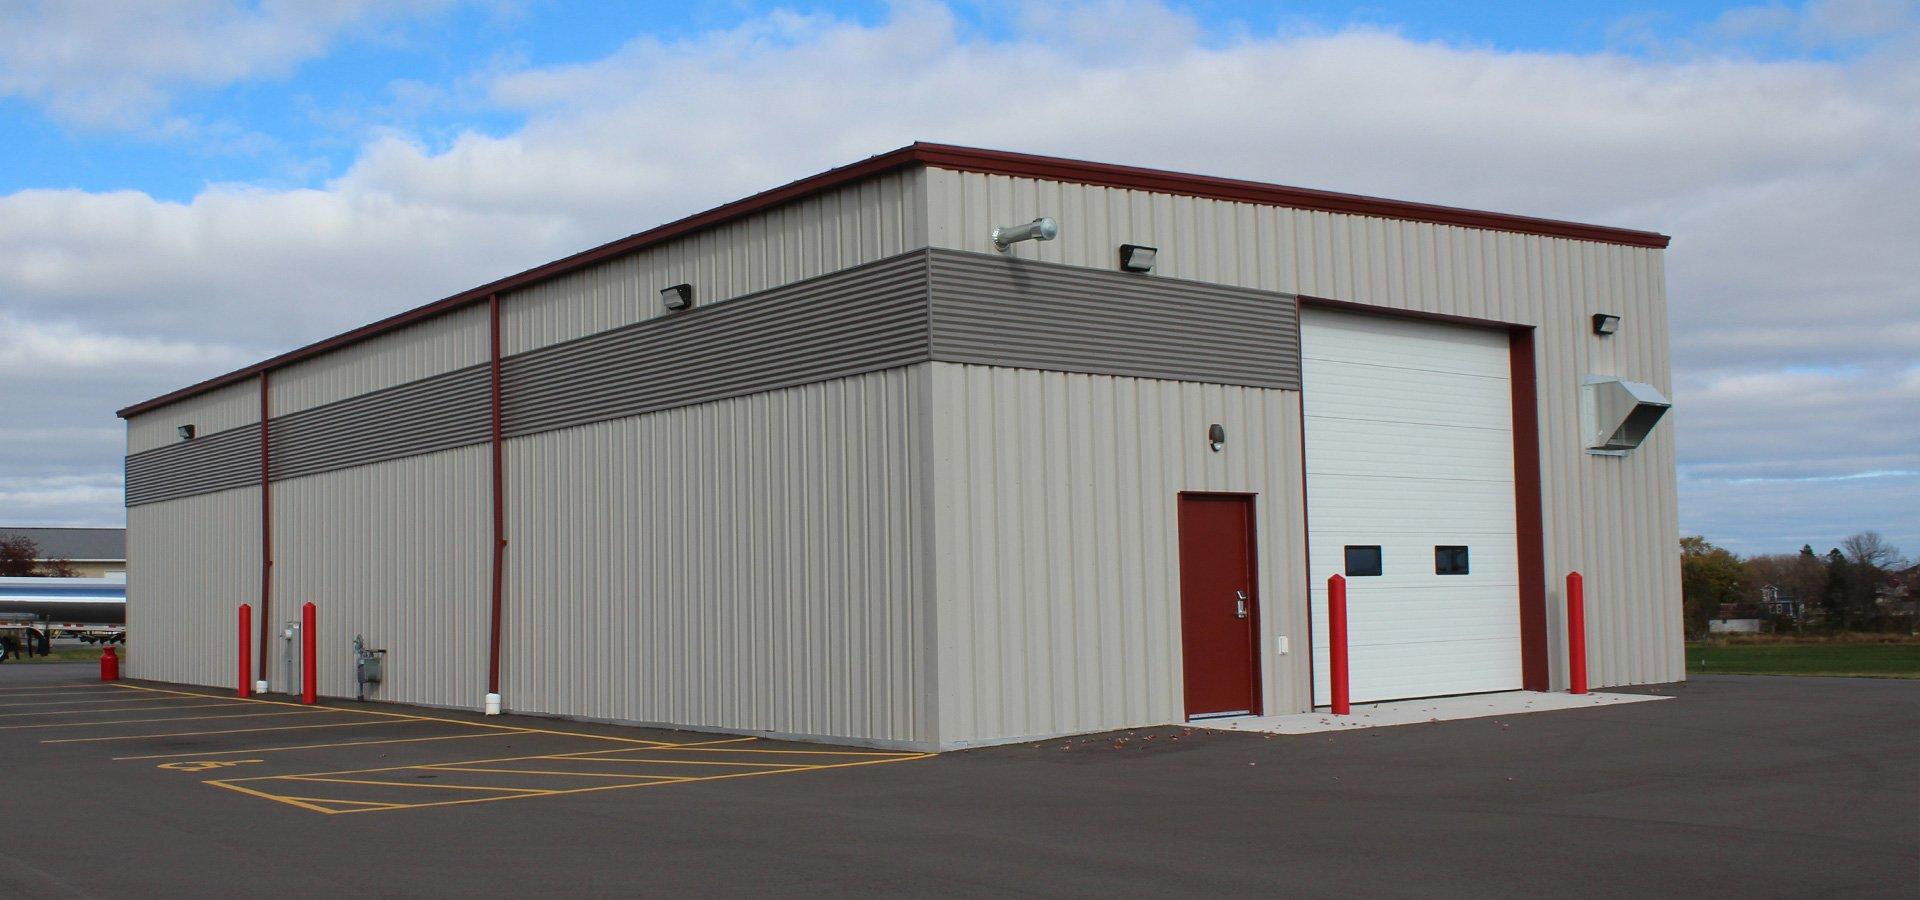 Fleet Maintenance Shop Full Exterior Angle Shot